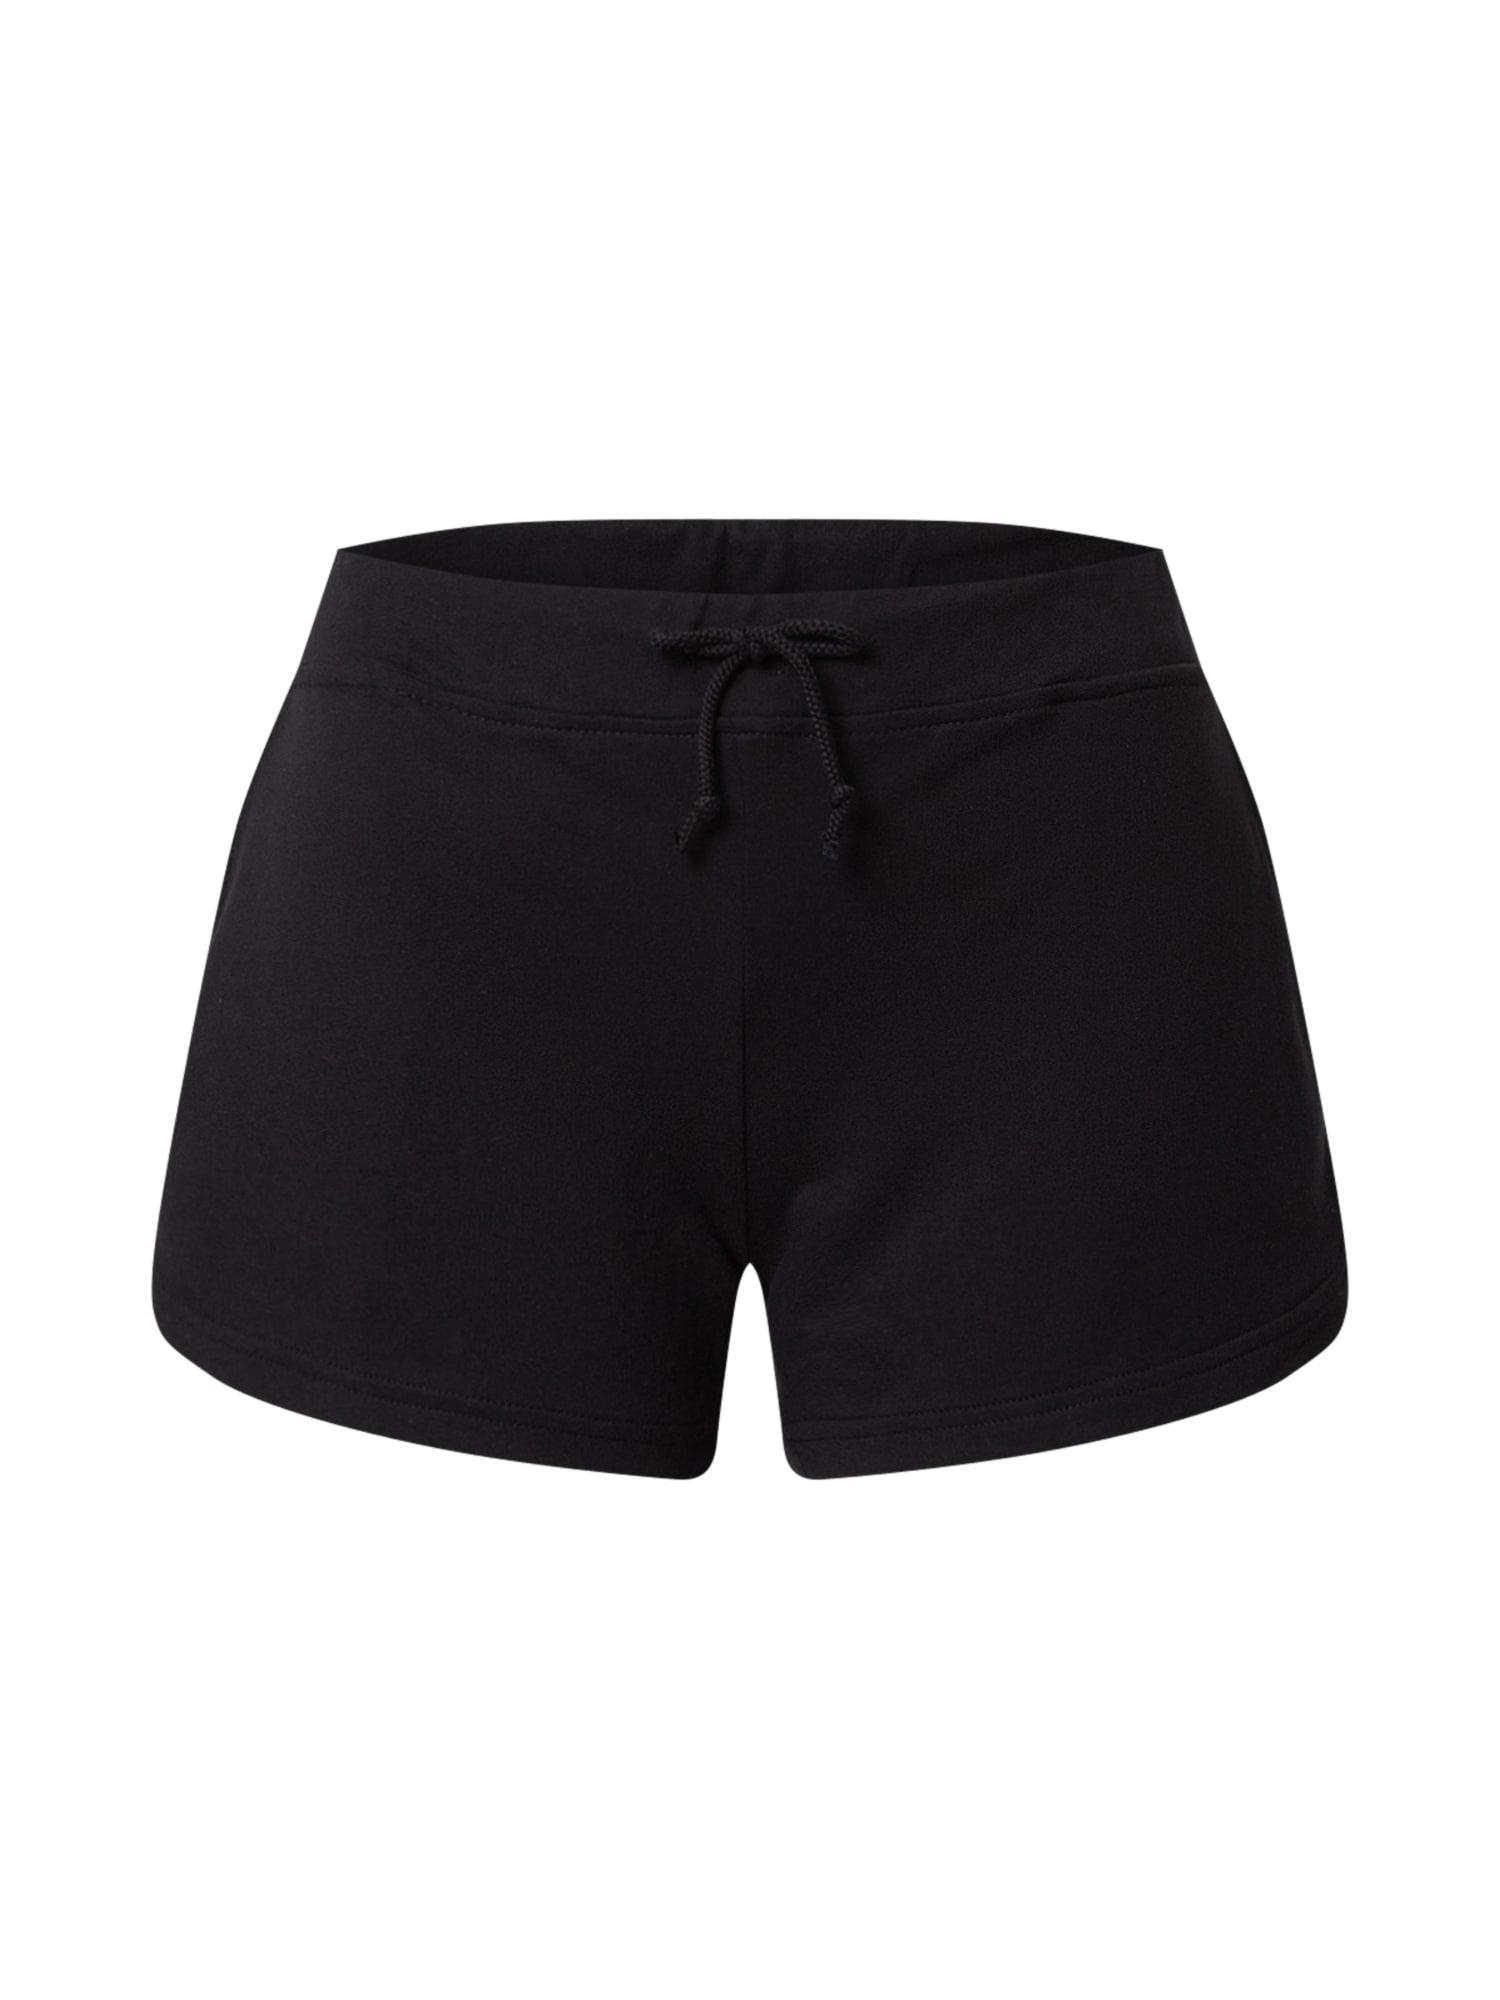 Degree Kelnės 'Shorter' juoda